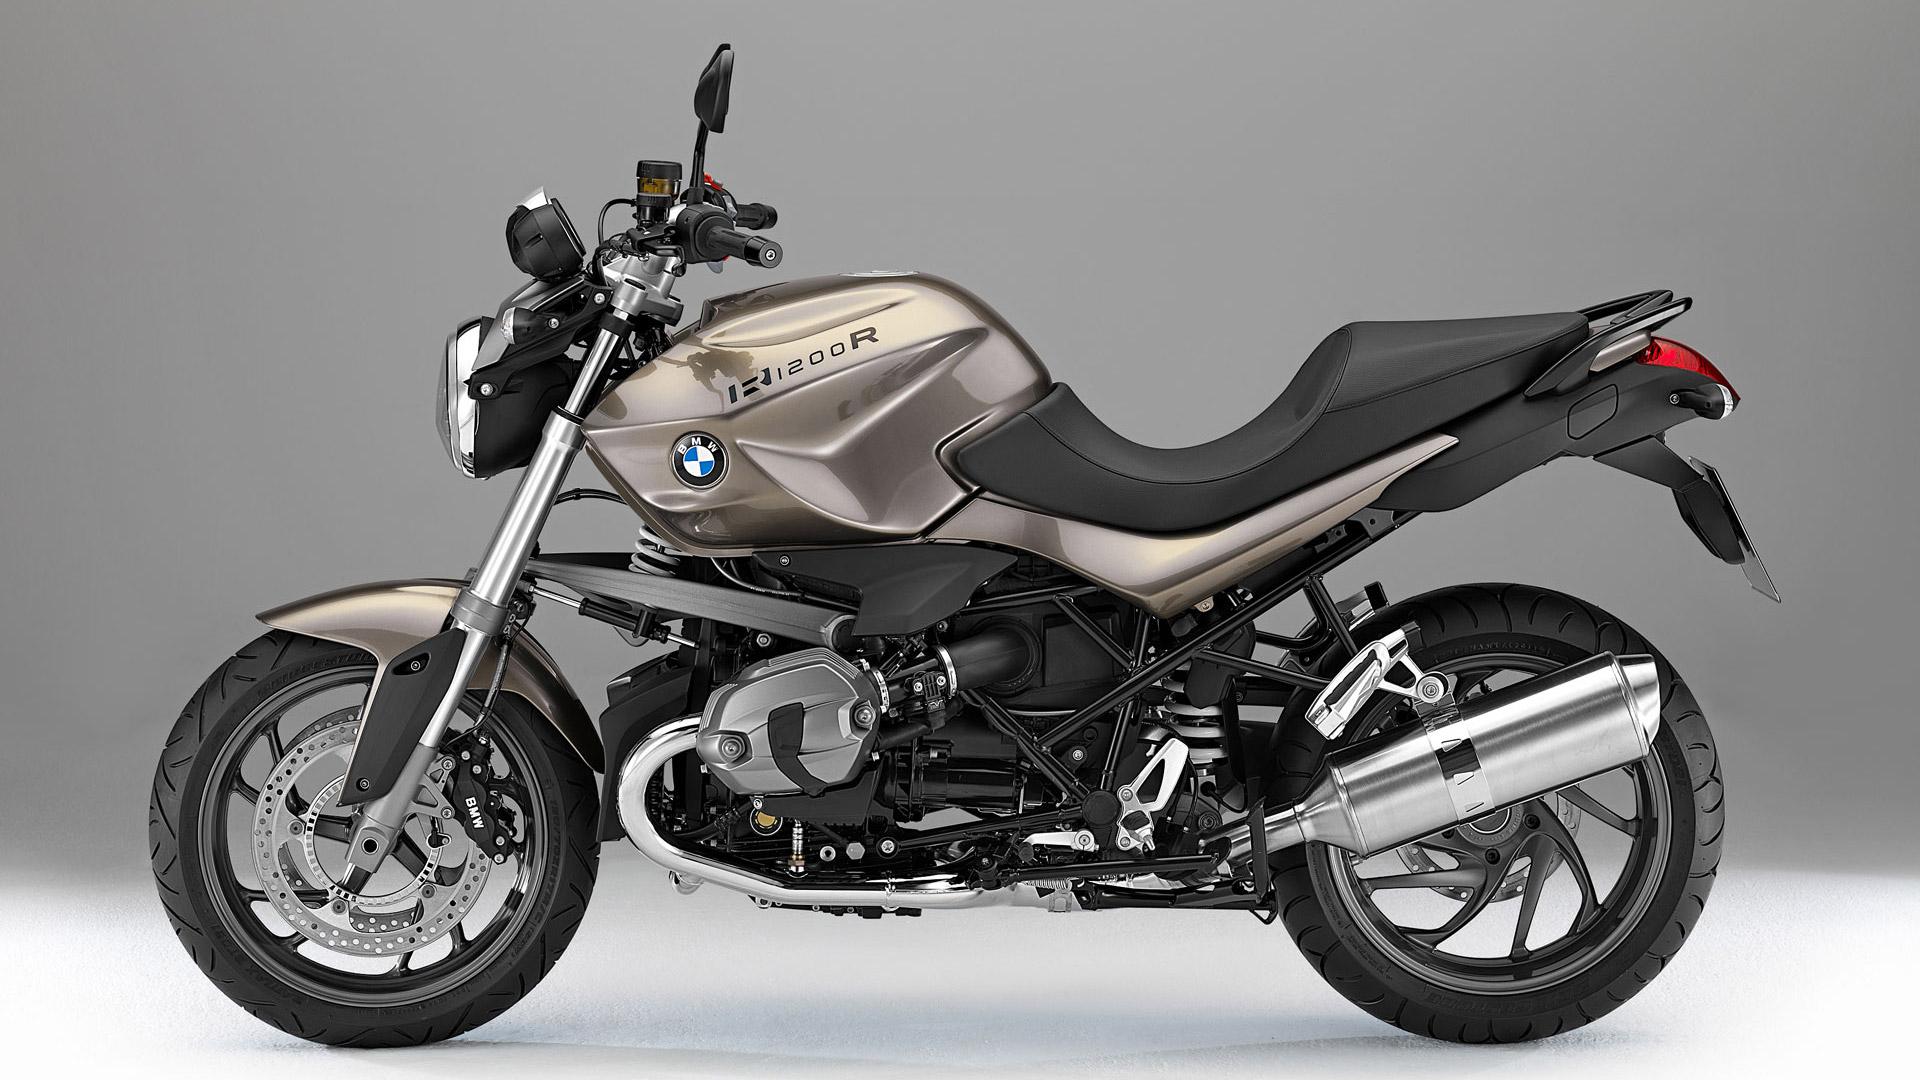 BMW 350 enduro-style model coming soon